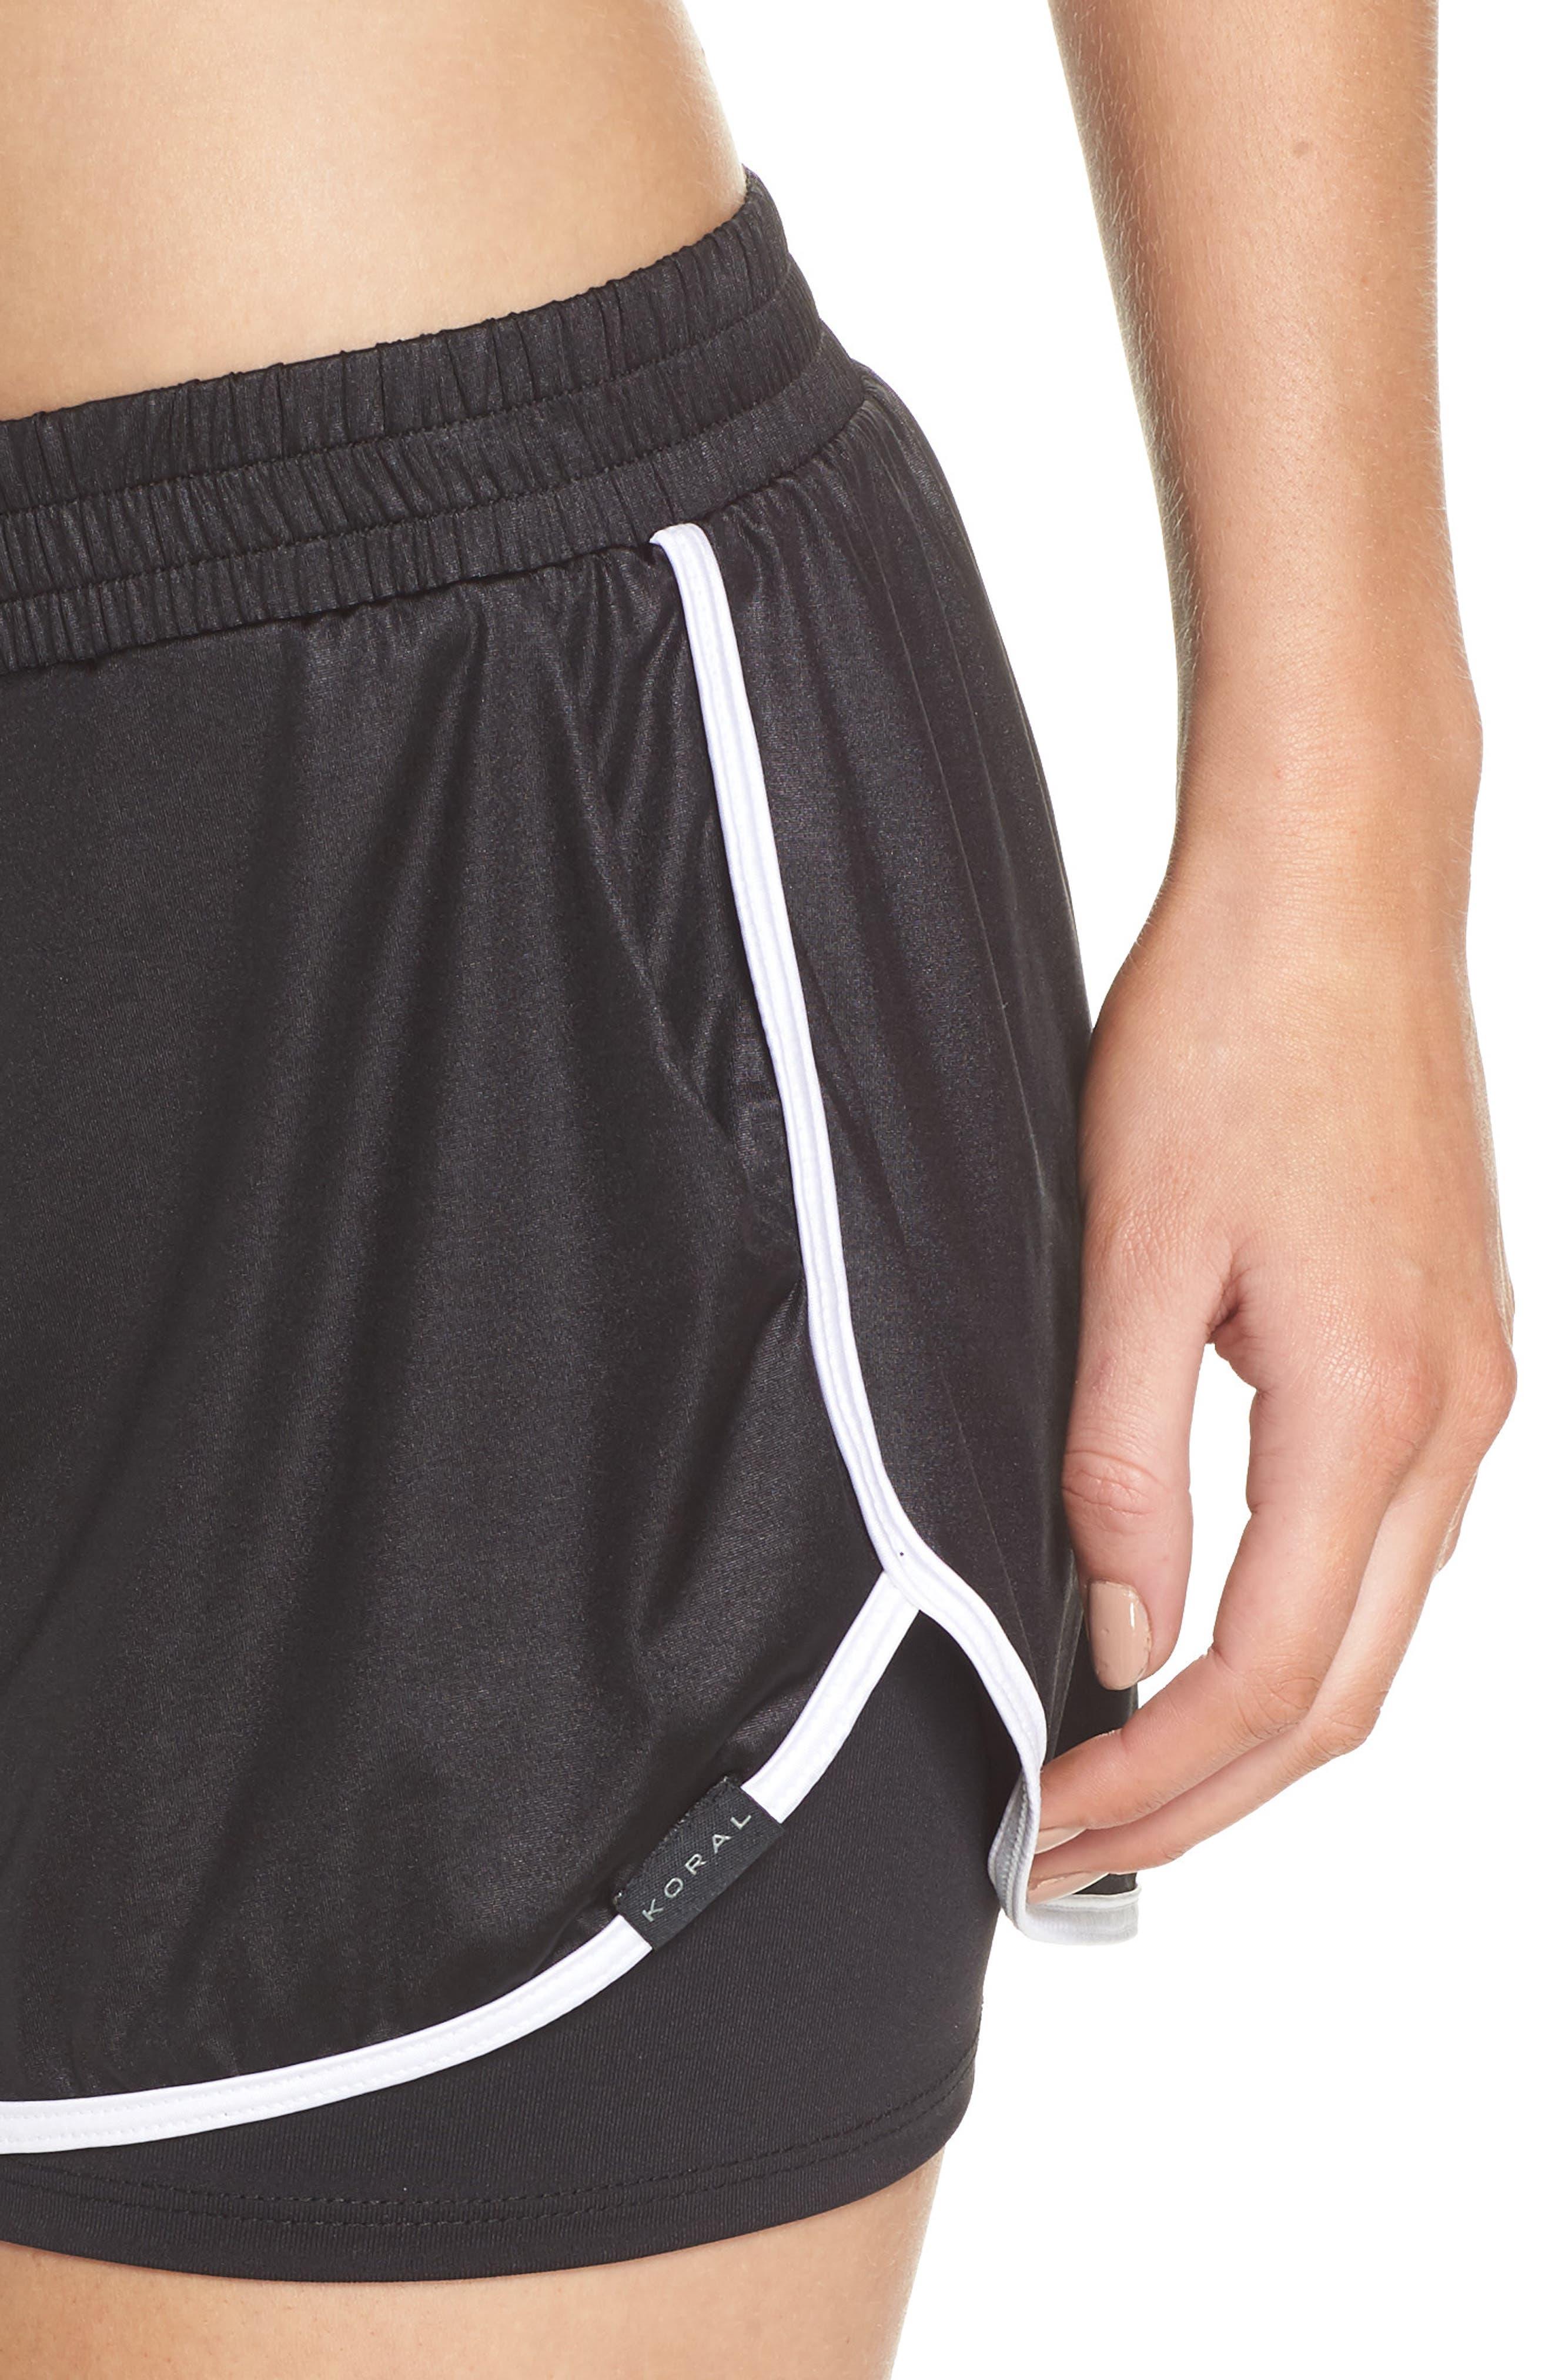 Scout Gym Shorts,                             Alternate thumbnail 4, color,                             BLACK/ WHITE